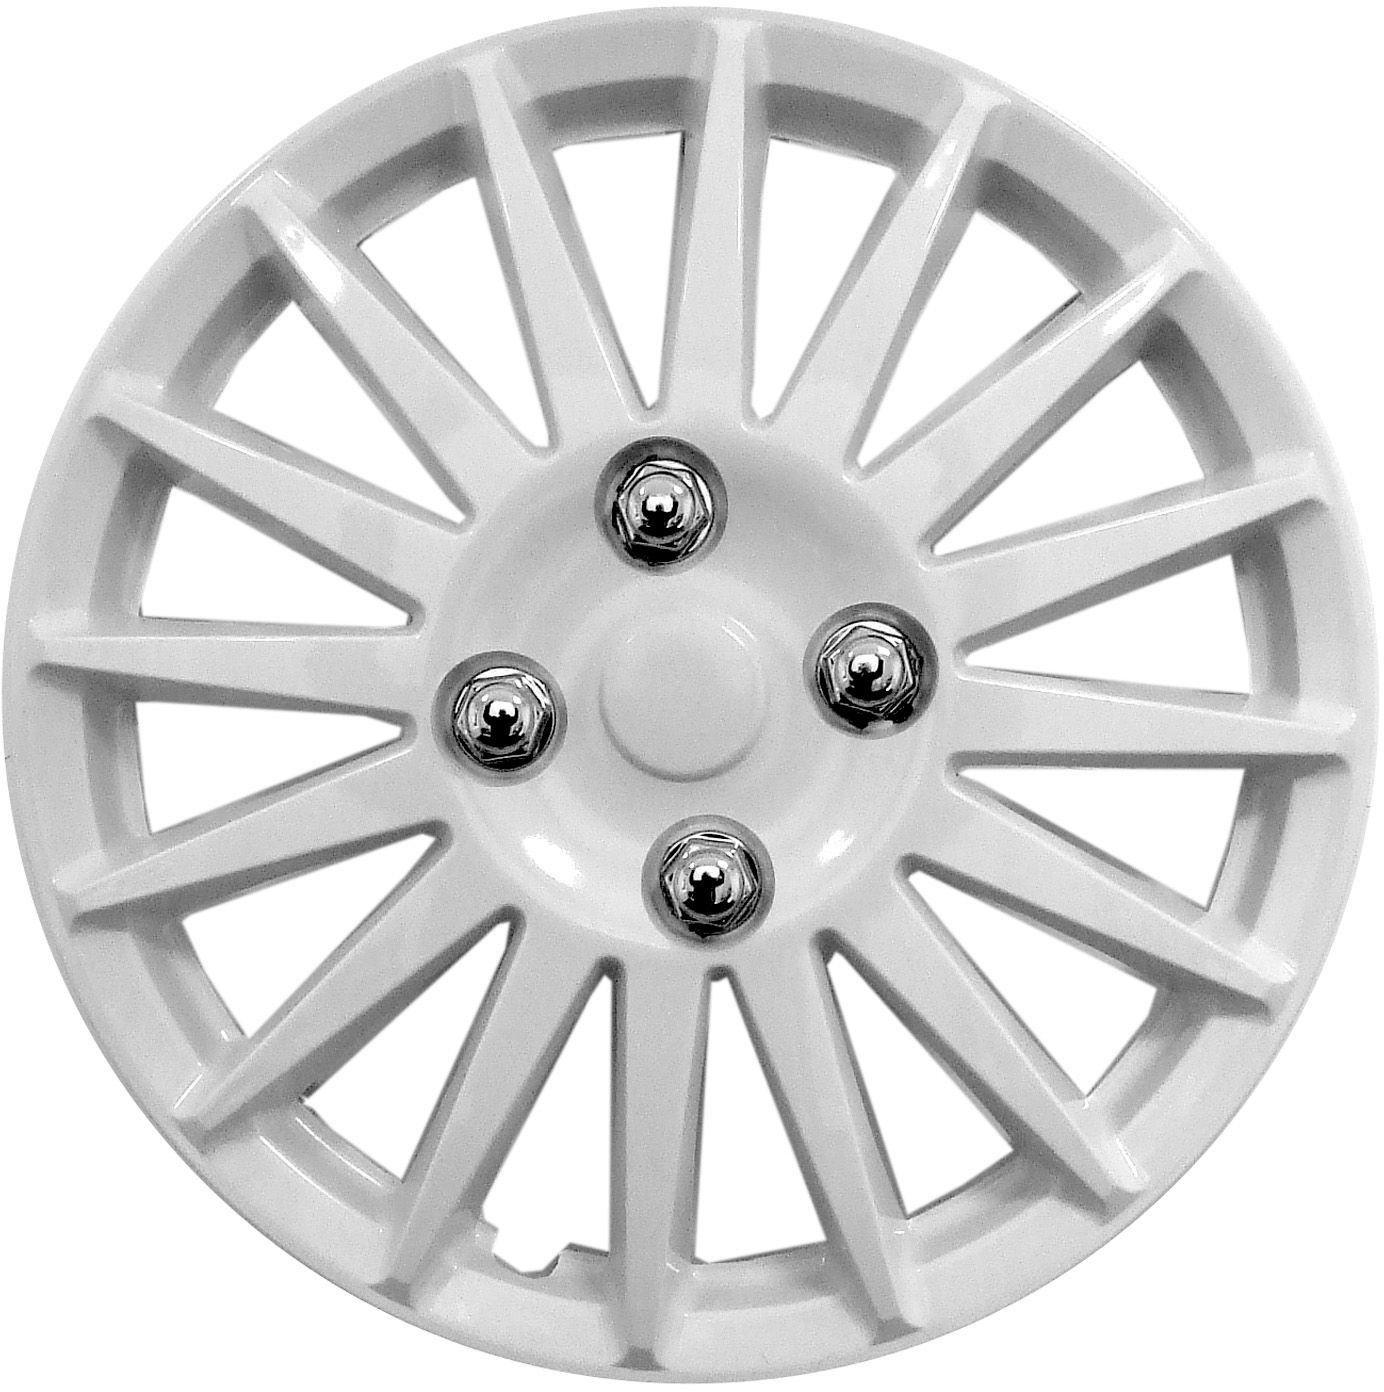 Streetwize 14 Inch White Gloss Wheel Trims